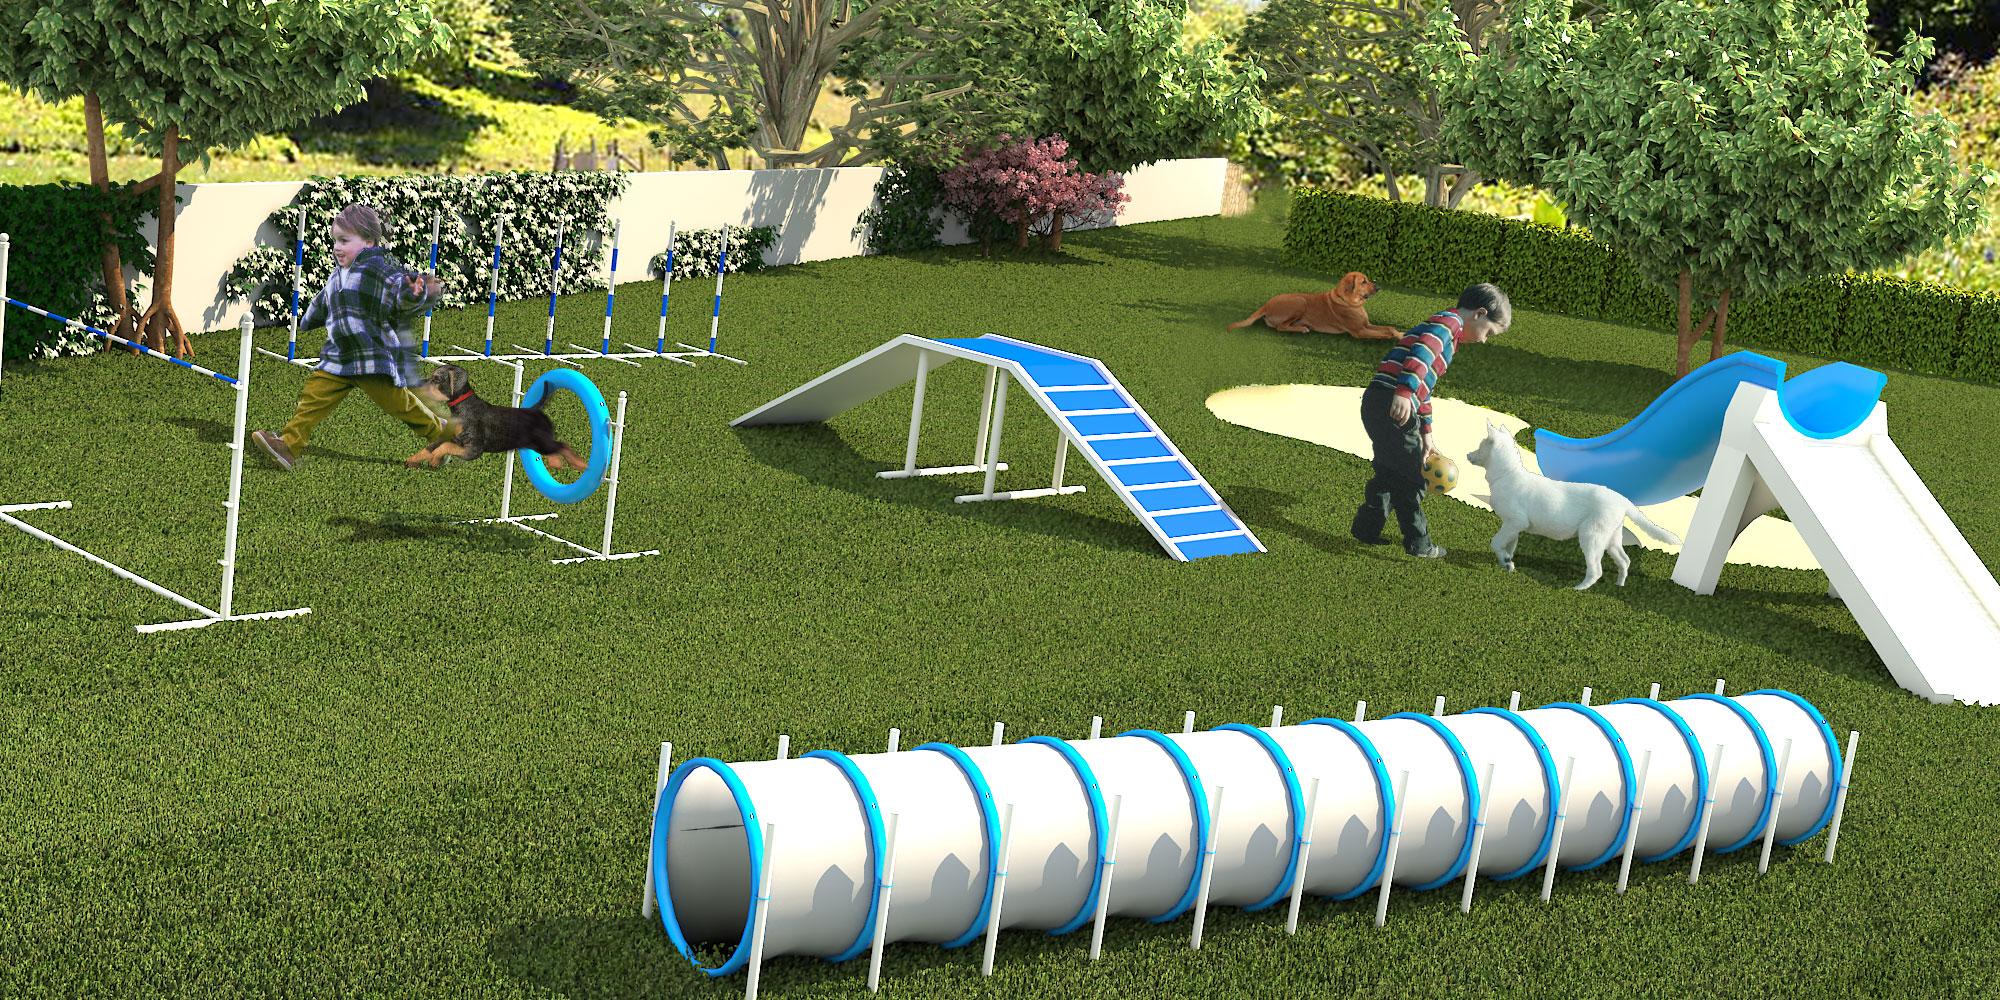 Perspectiva-Ilustrativa--playdog-Ecoplace-Maricá-RJ